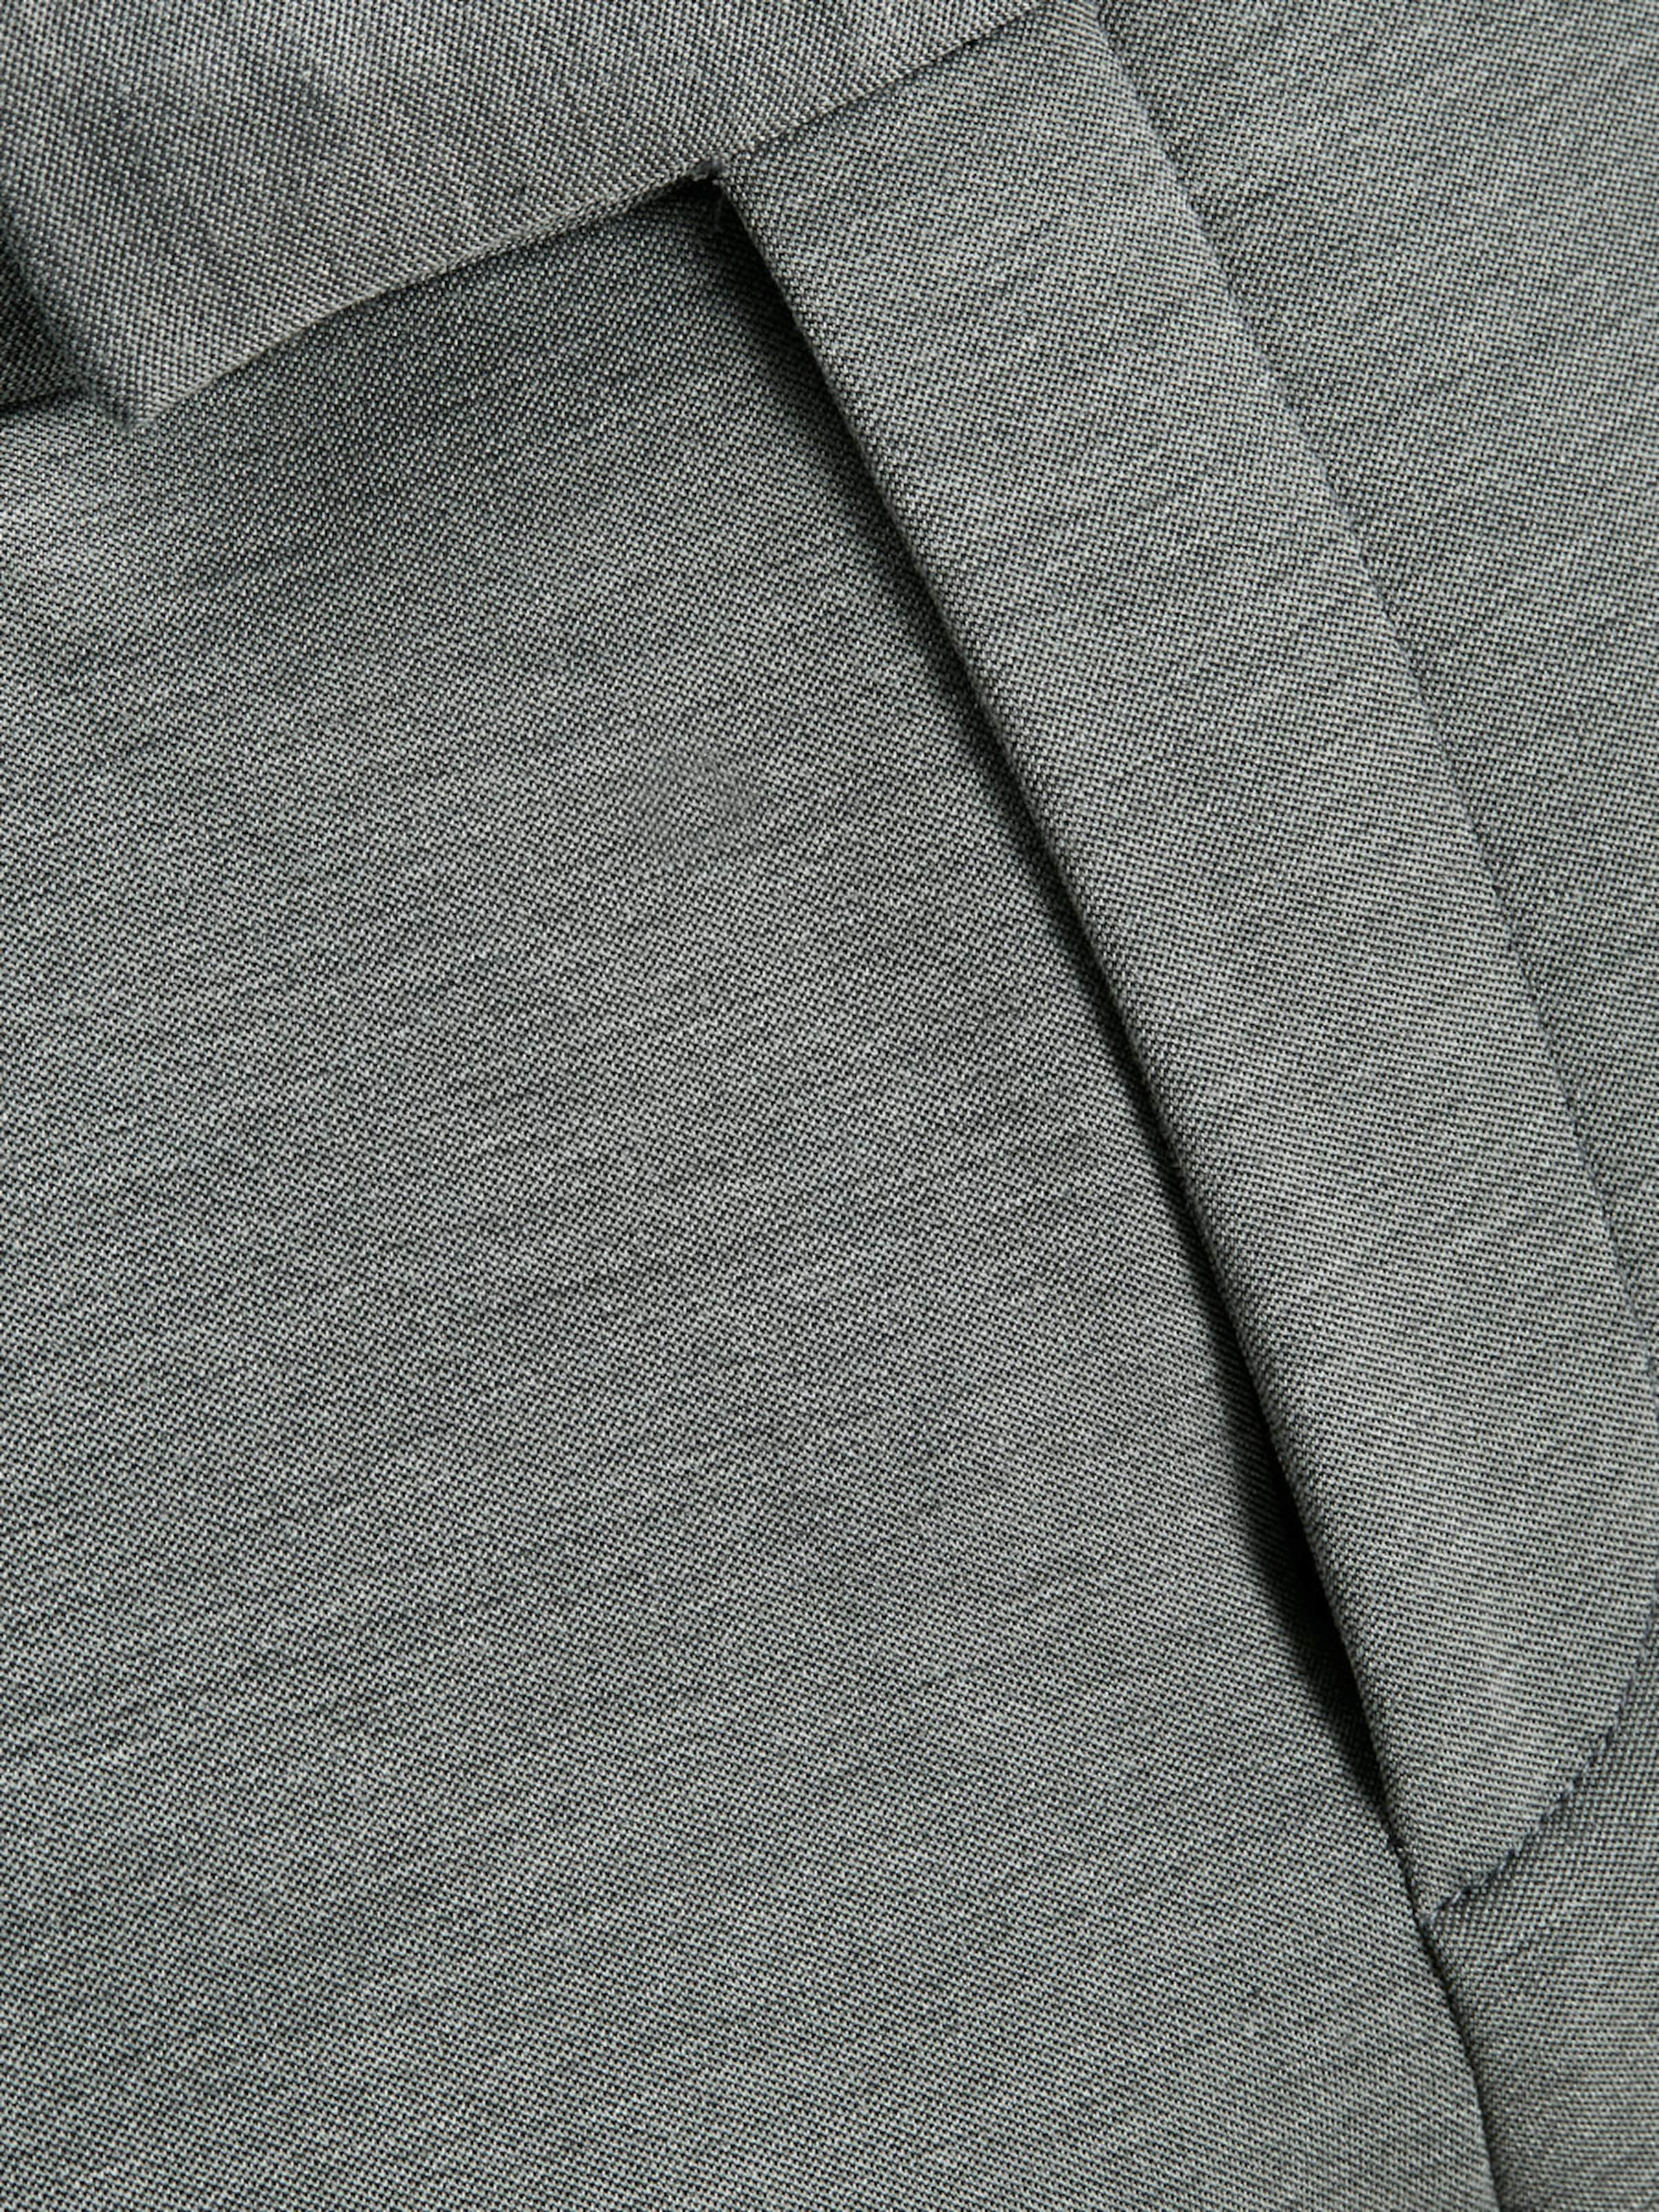 Jones Grau Jackamp; In Hose Moderne xeoCBd